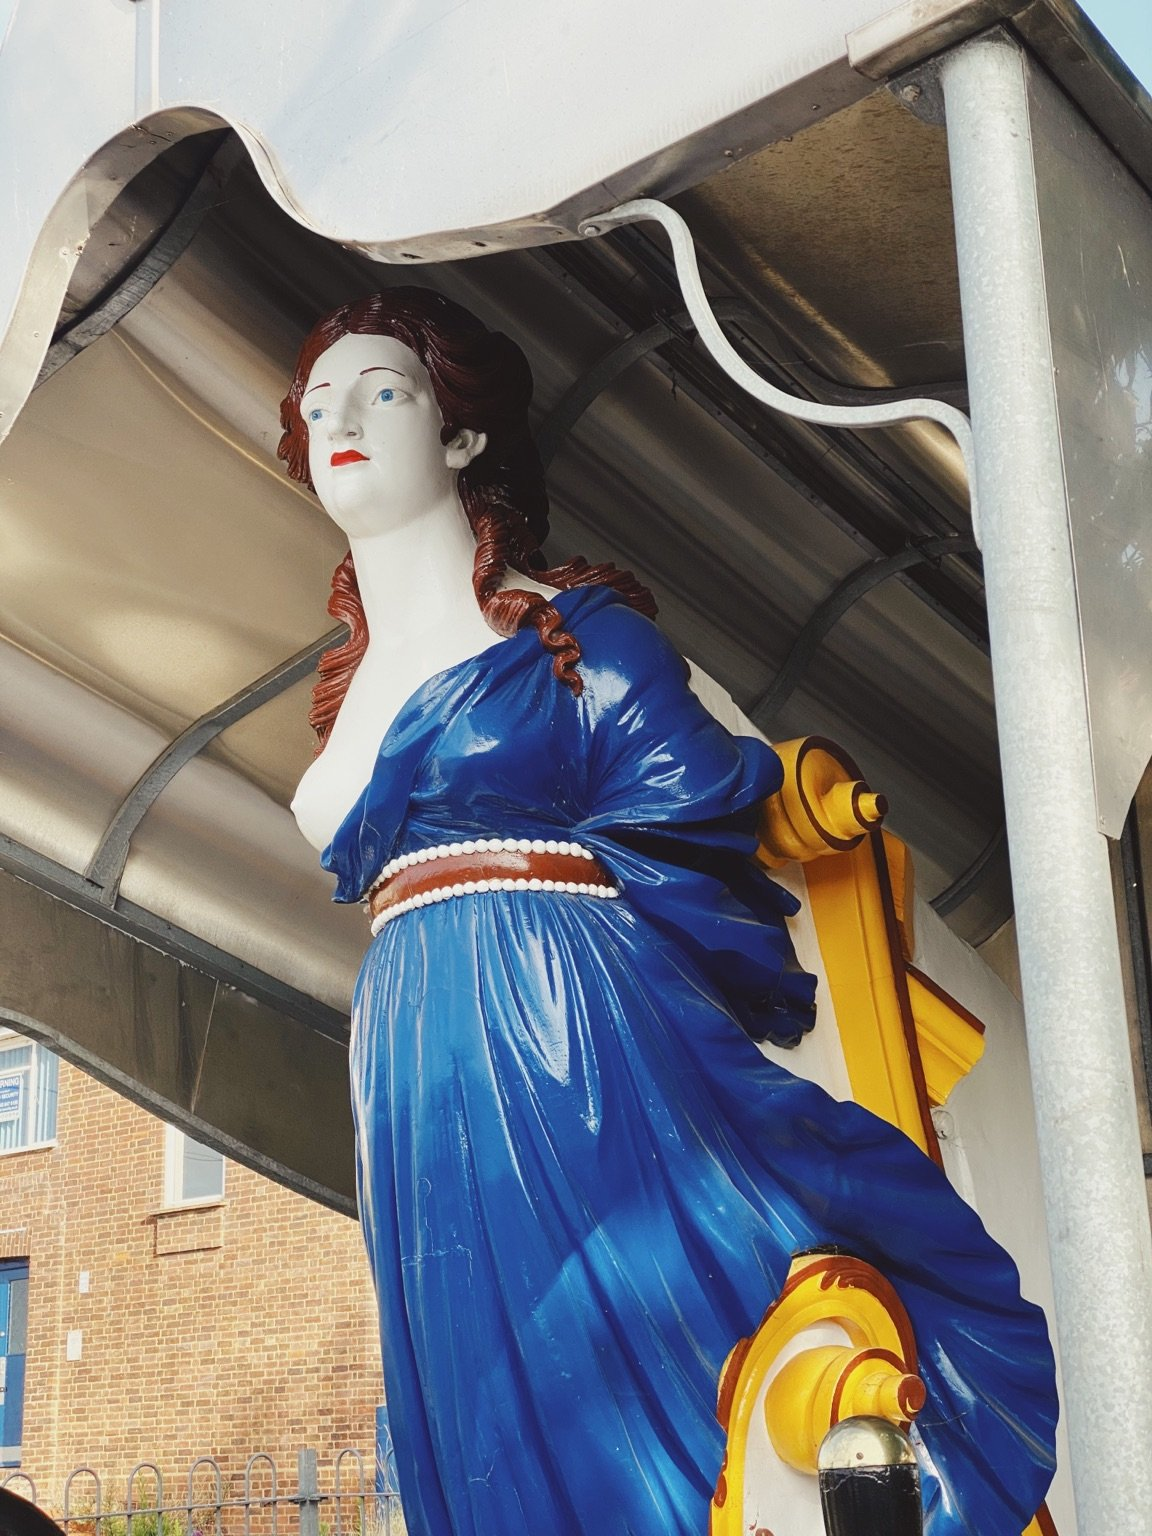 upnor statue